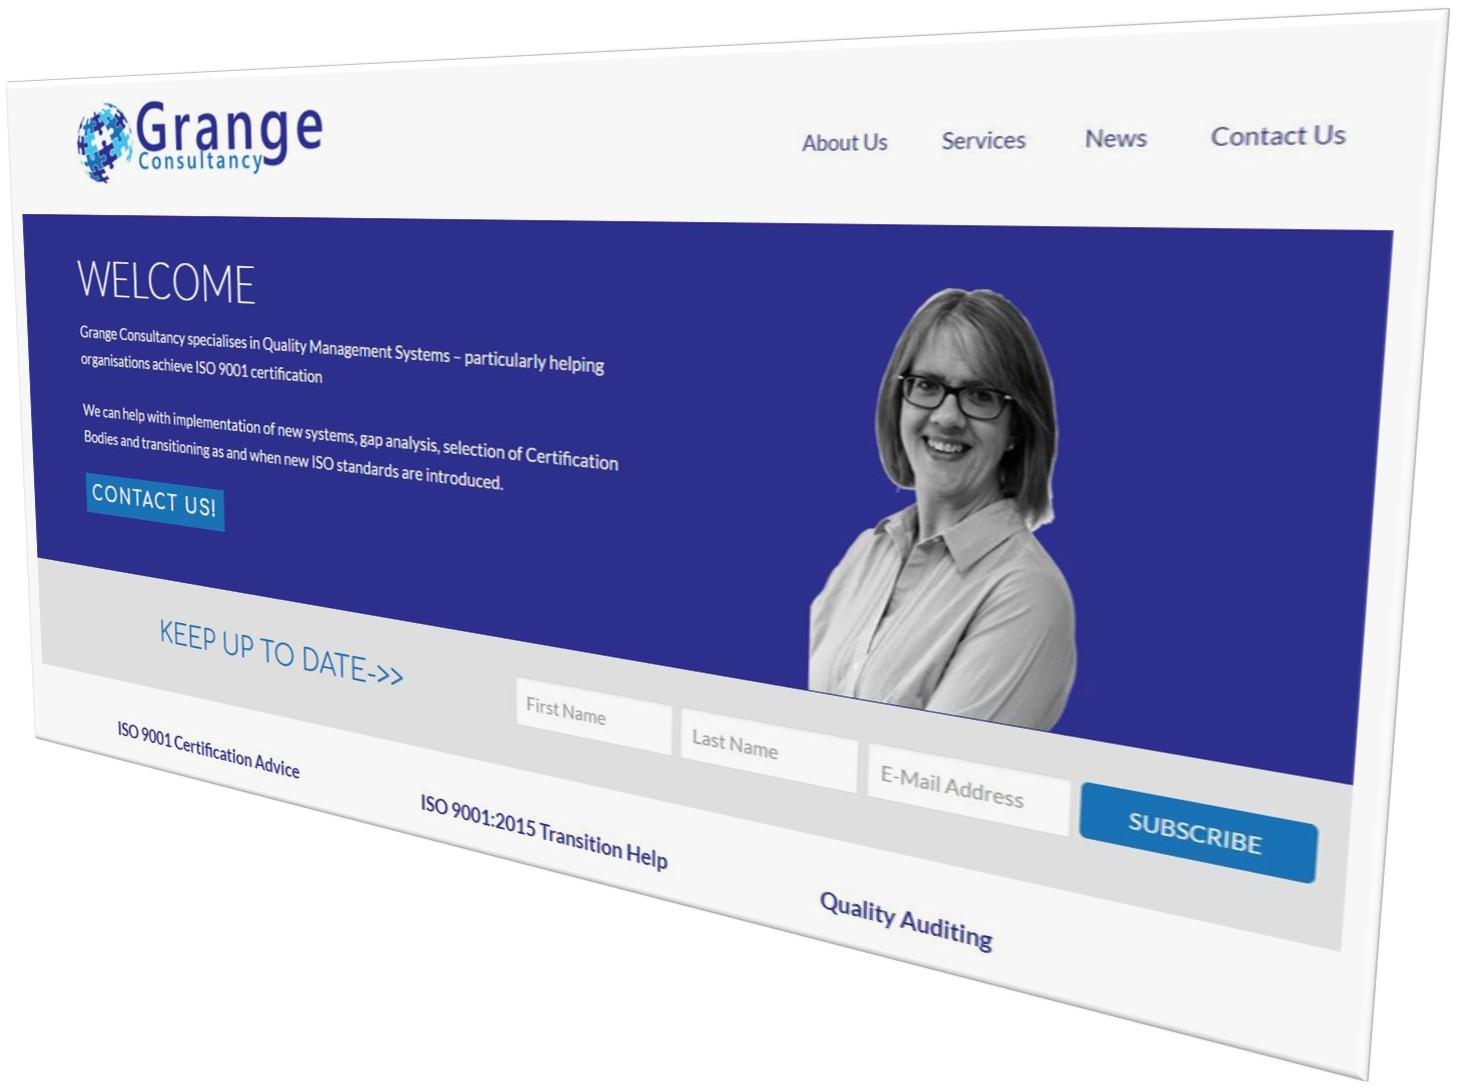 Grange Consultancy